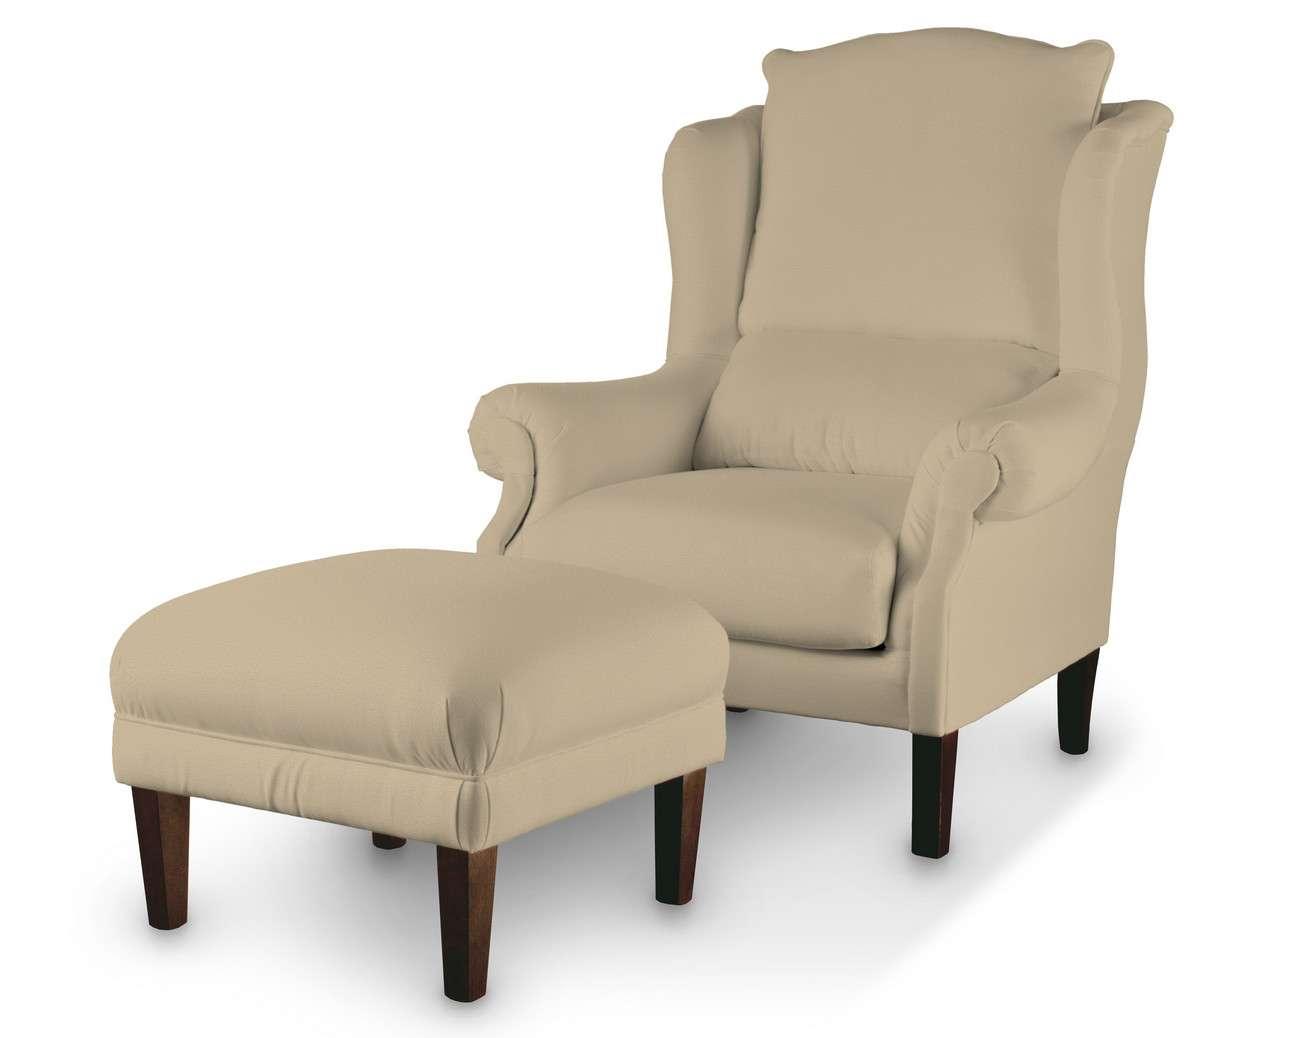 Podnóżek do fotela w kolekcji Living, tkanina: 160-82